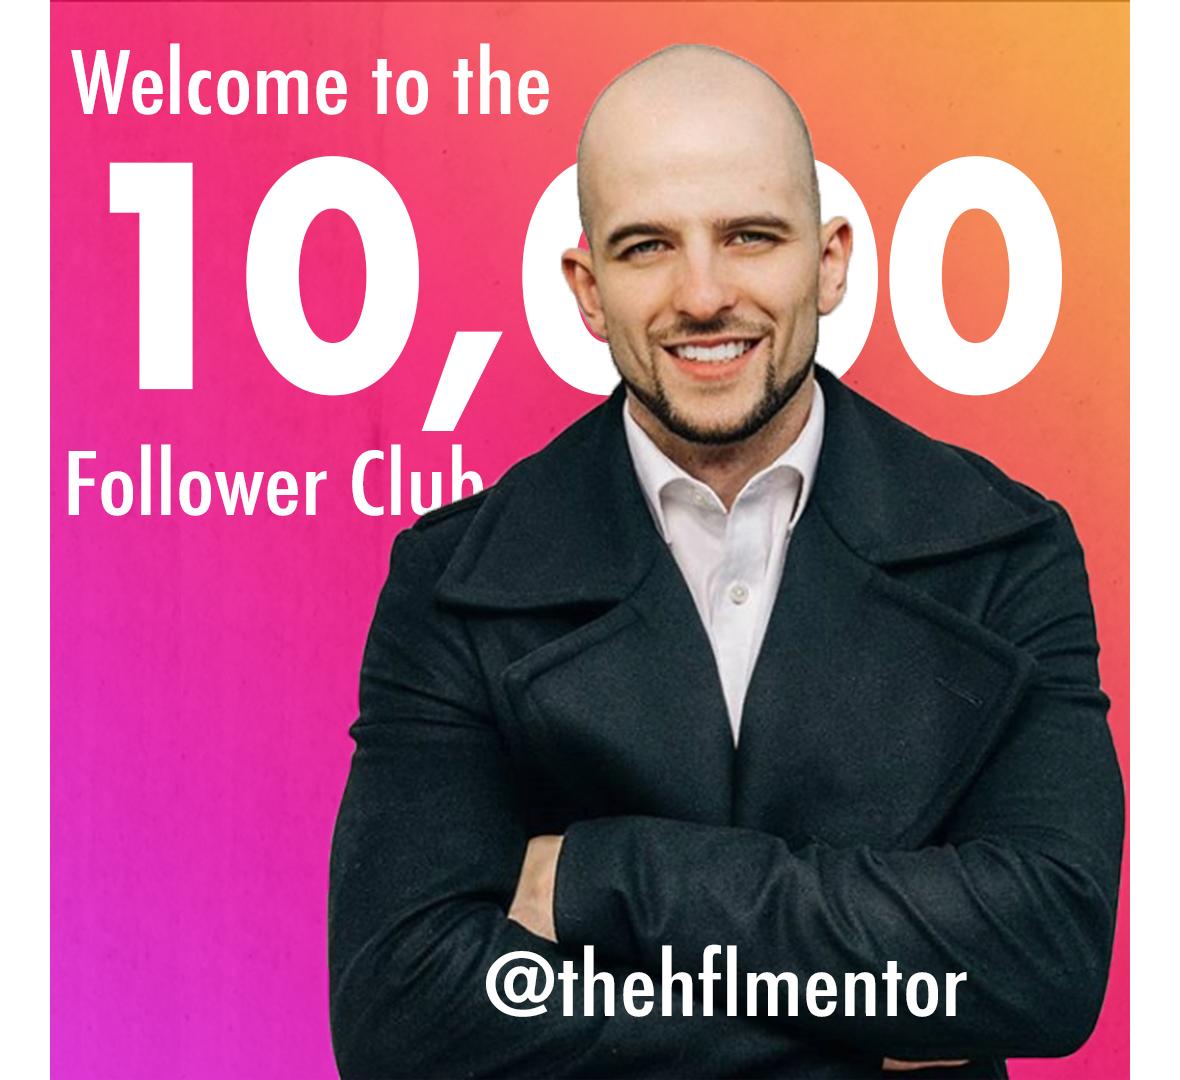 thehflmentor_10k club.jpg